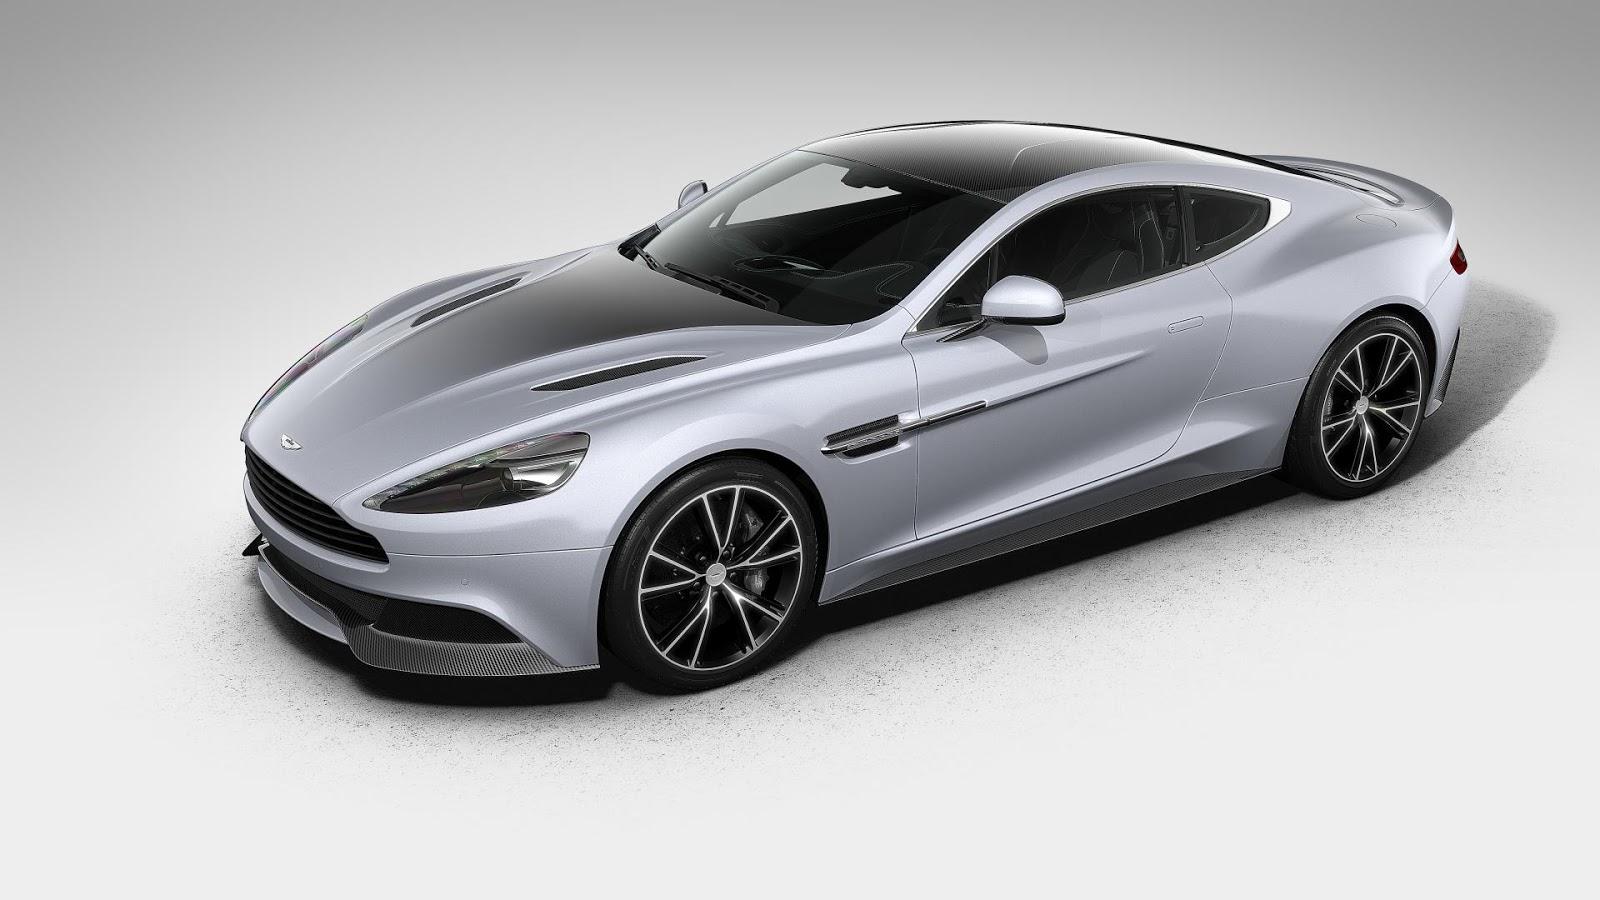 Aston Martin Vanquish Centenary 2013 Hottest Car